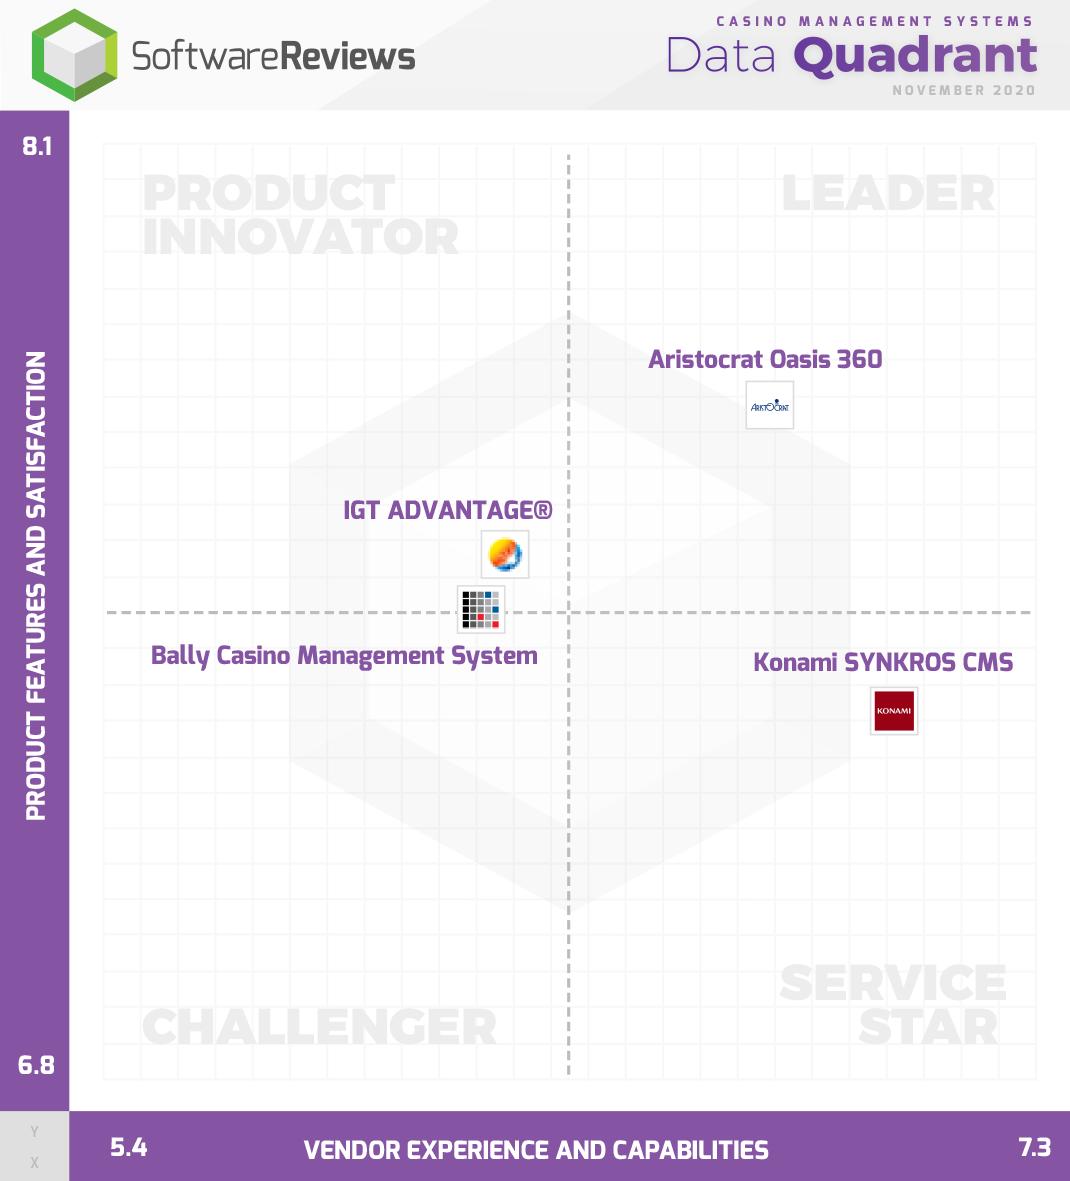 Casino Management Systems Data Quadrant